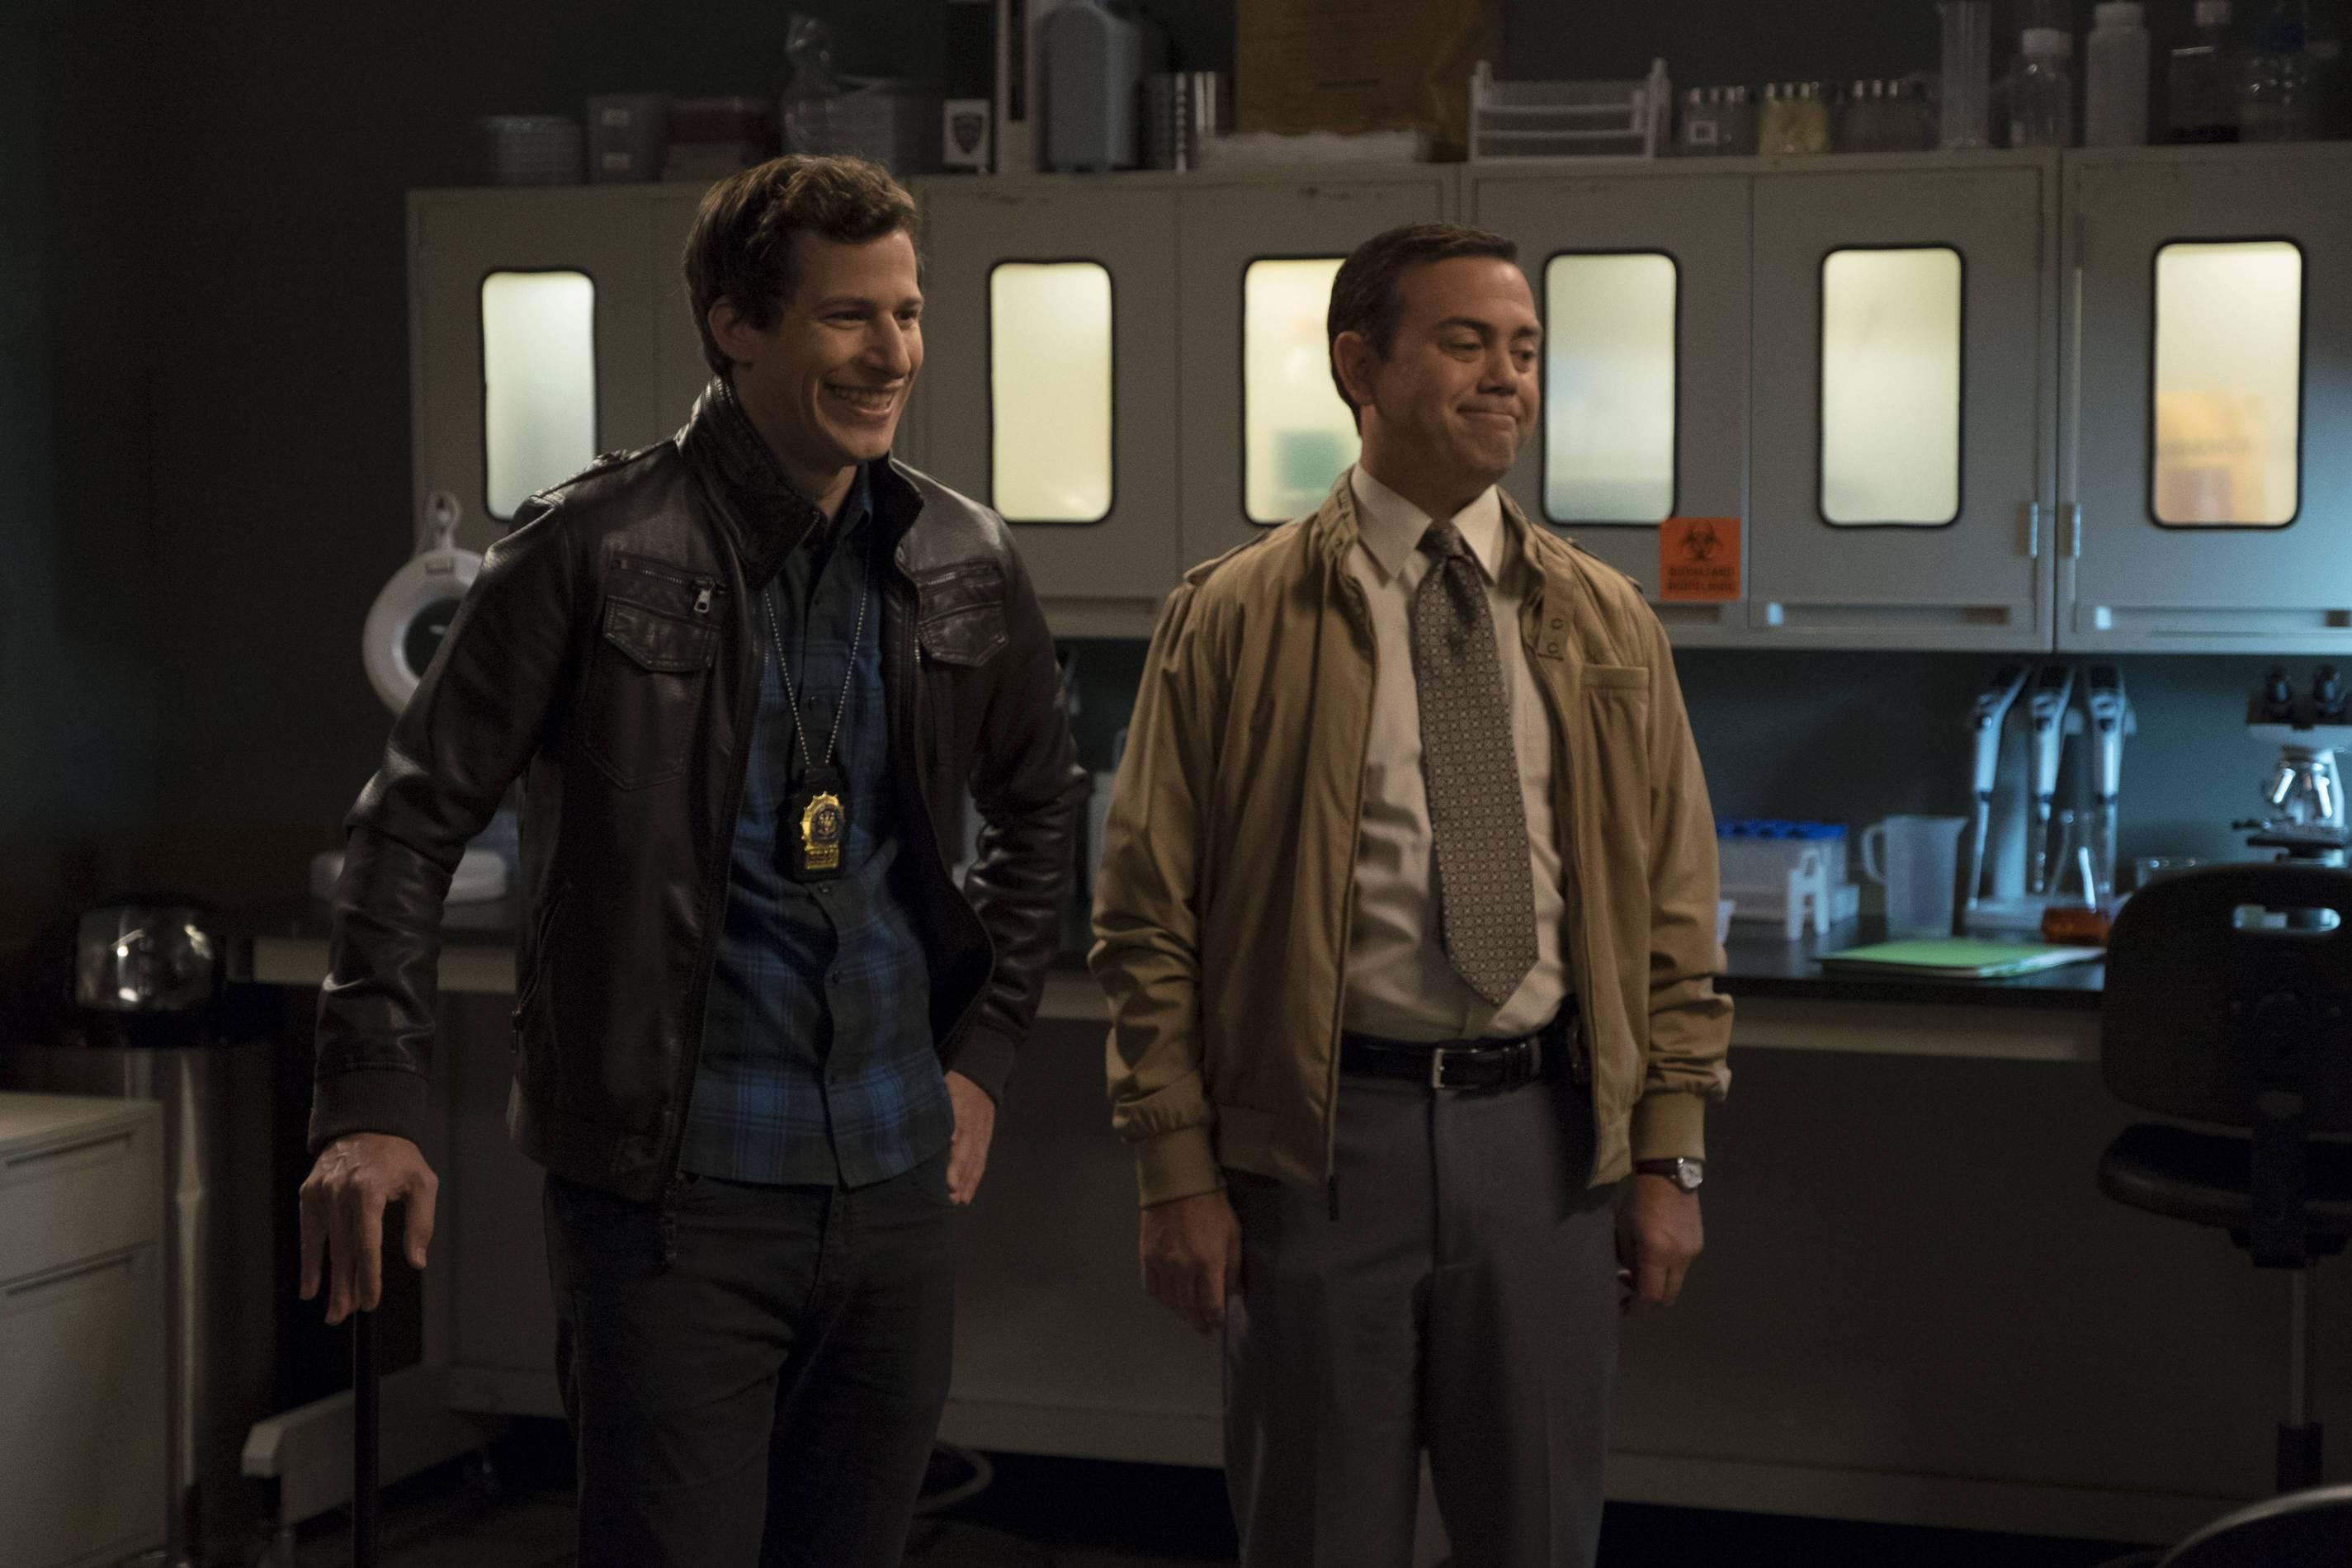 Brooklyn Nine-Nine: The Night Shift | Season 4 | Episode 4